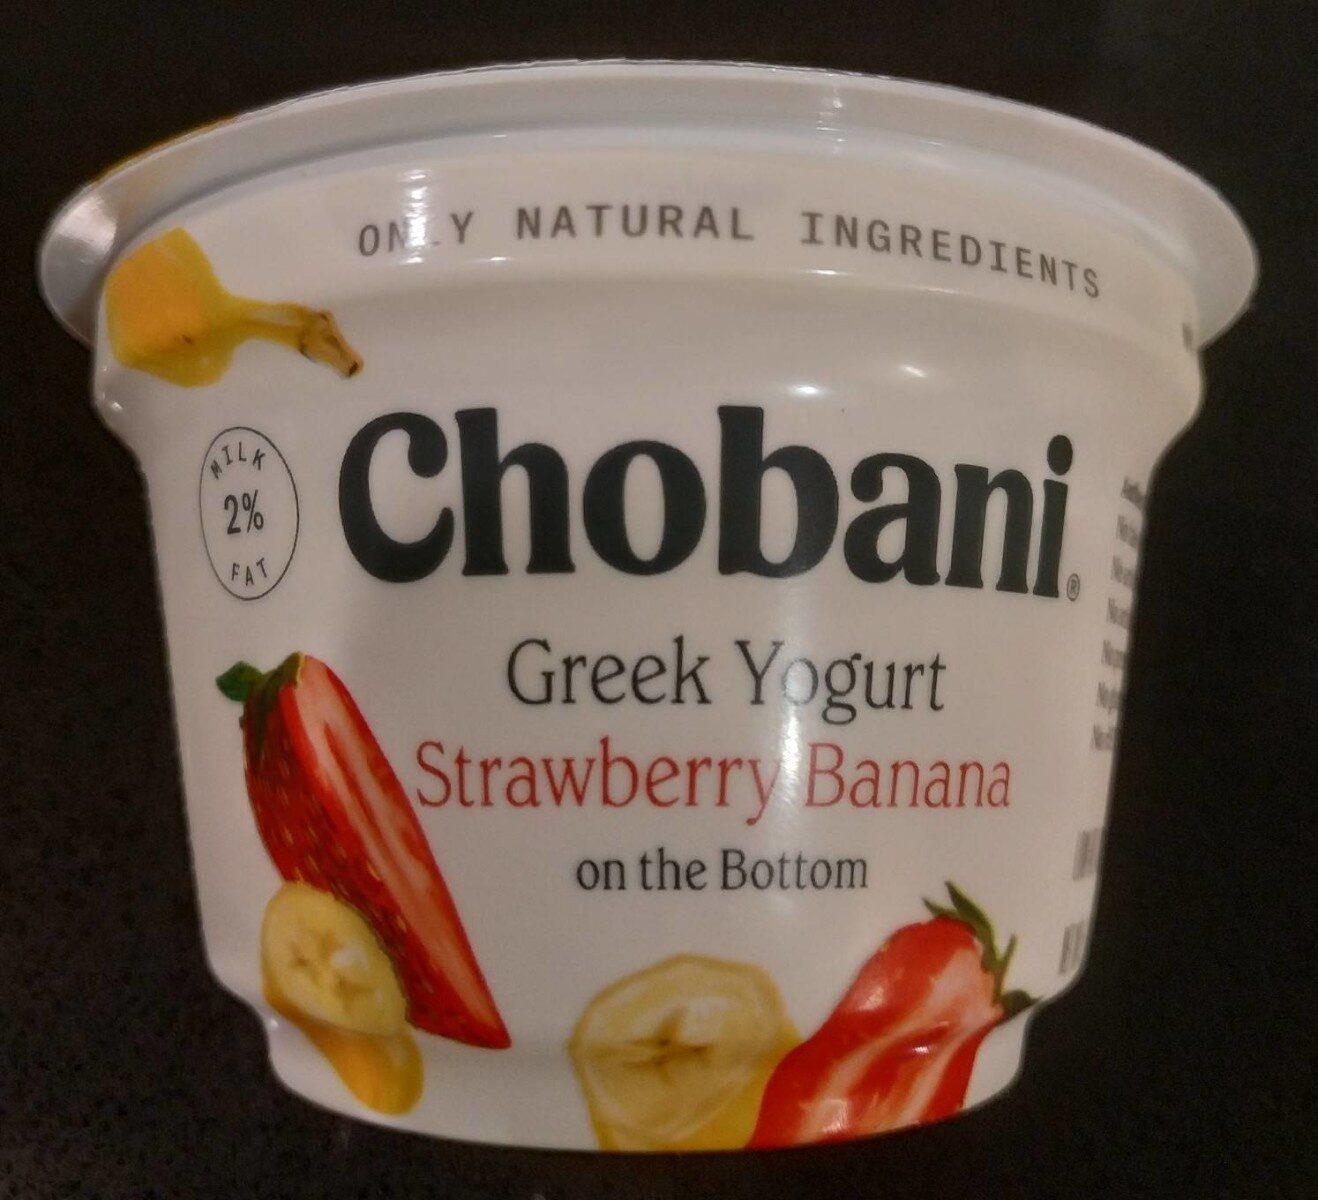 Chobani Greek Yogurt Strawberry Banana - Product